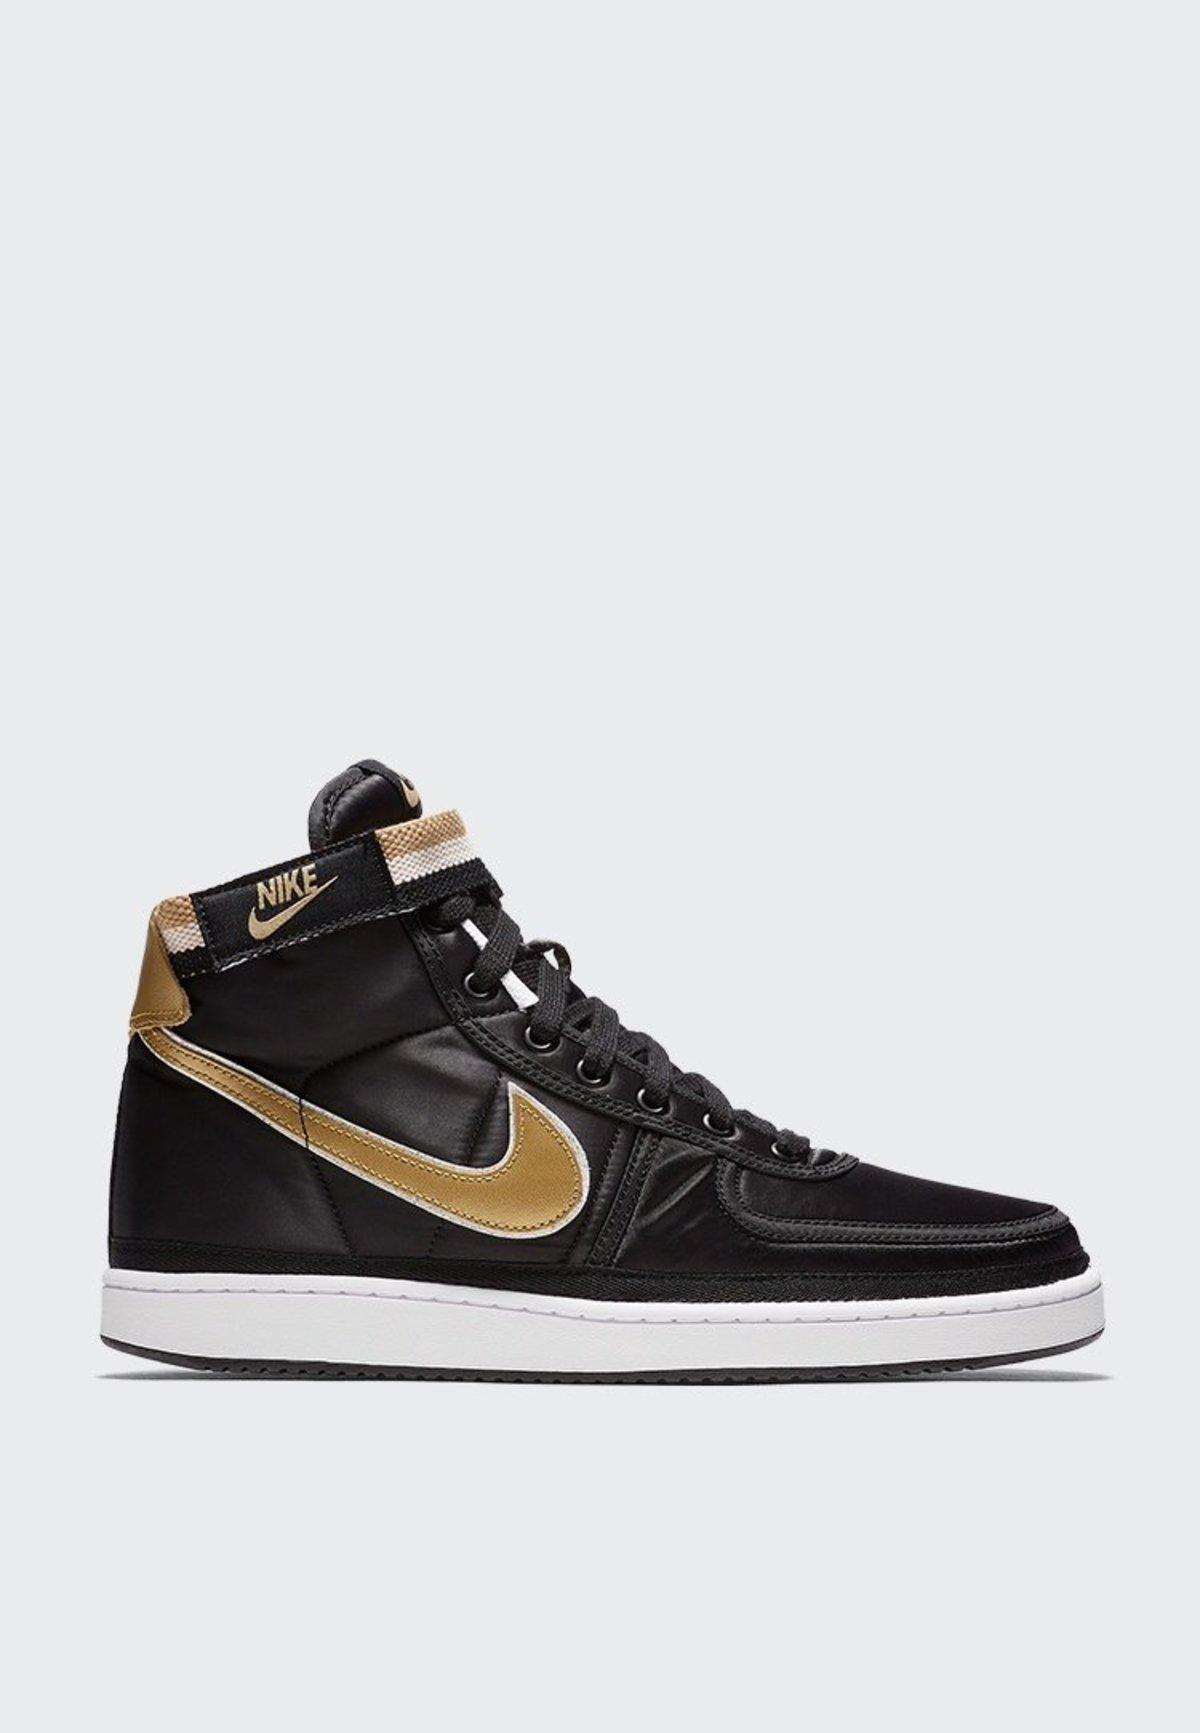 info for 90172 0c526 Unisex Nike Vandal High Supreme QS - BlackGold